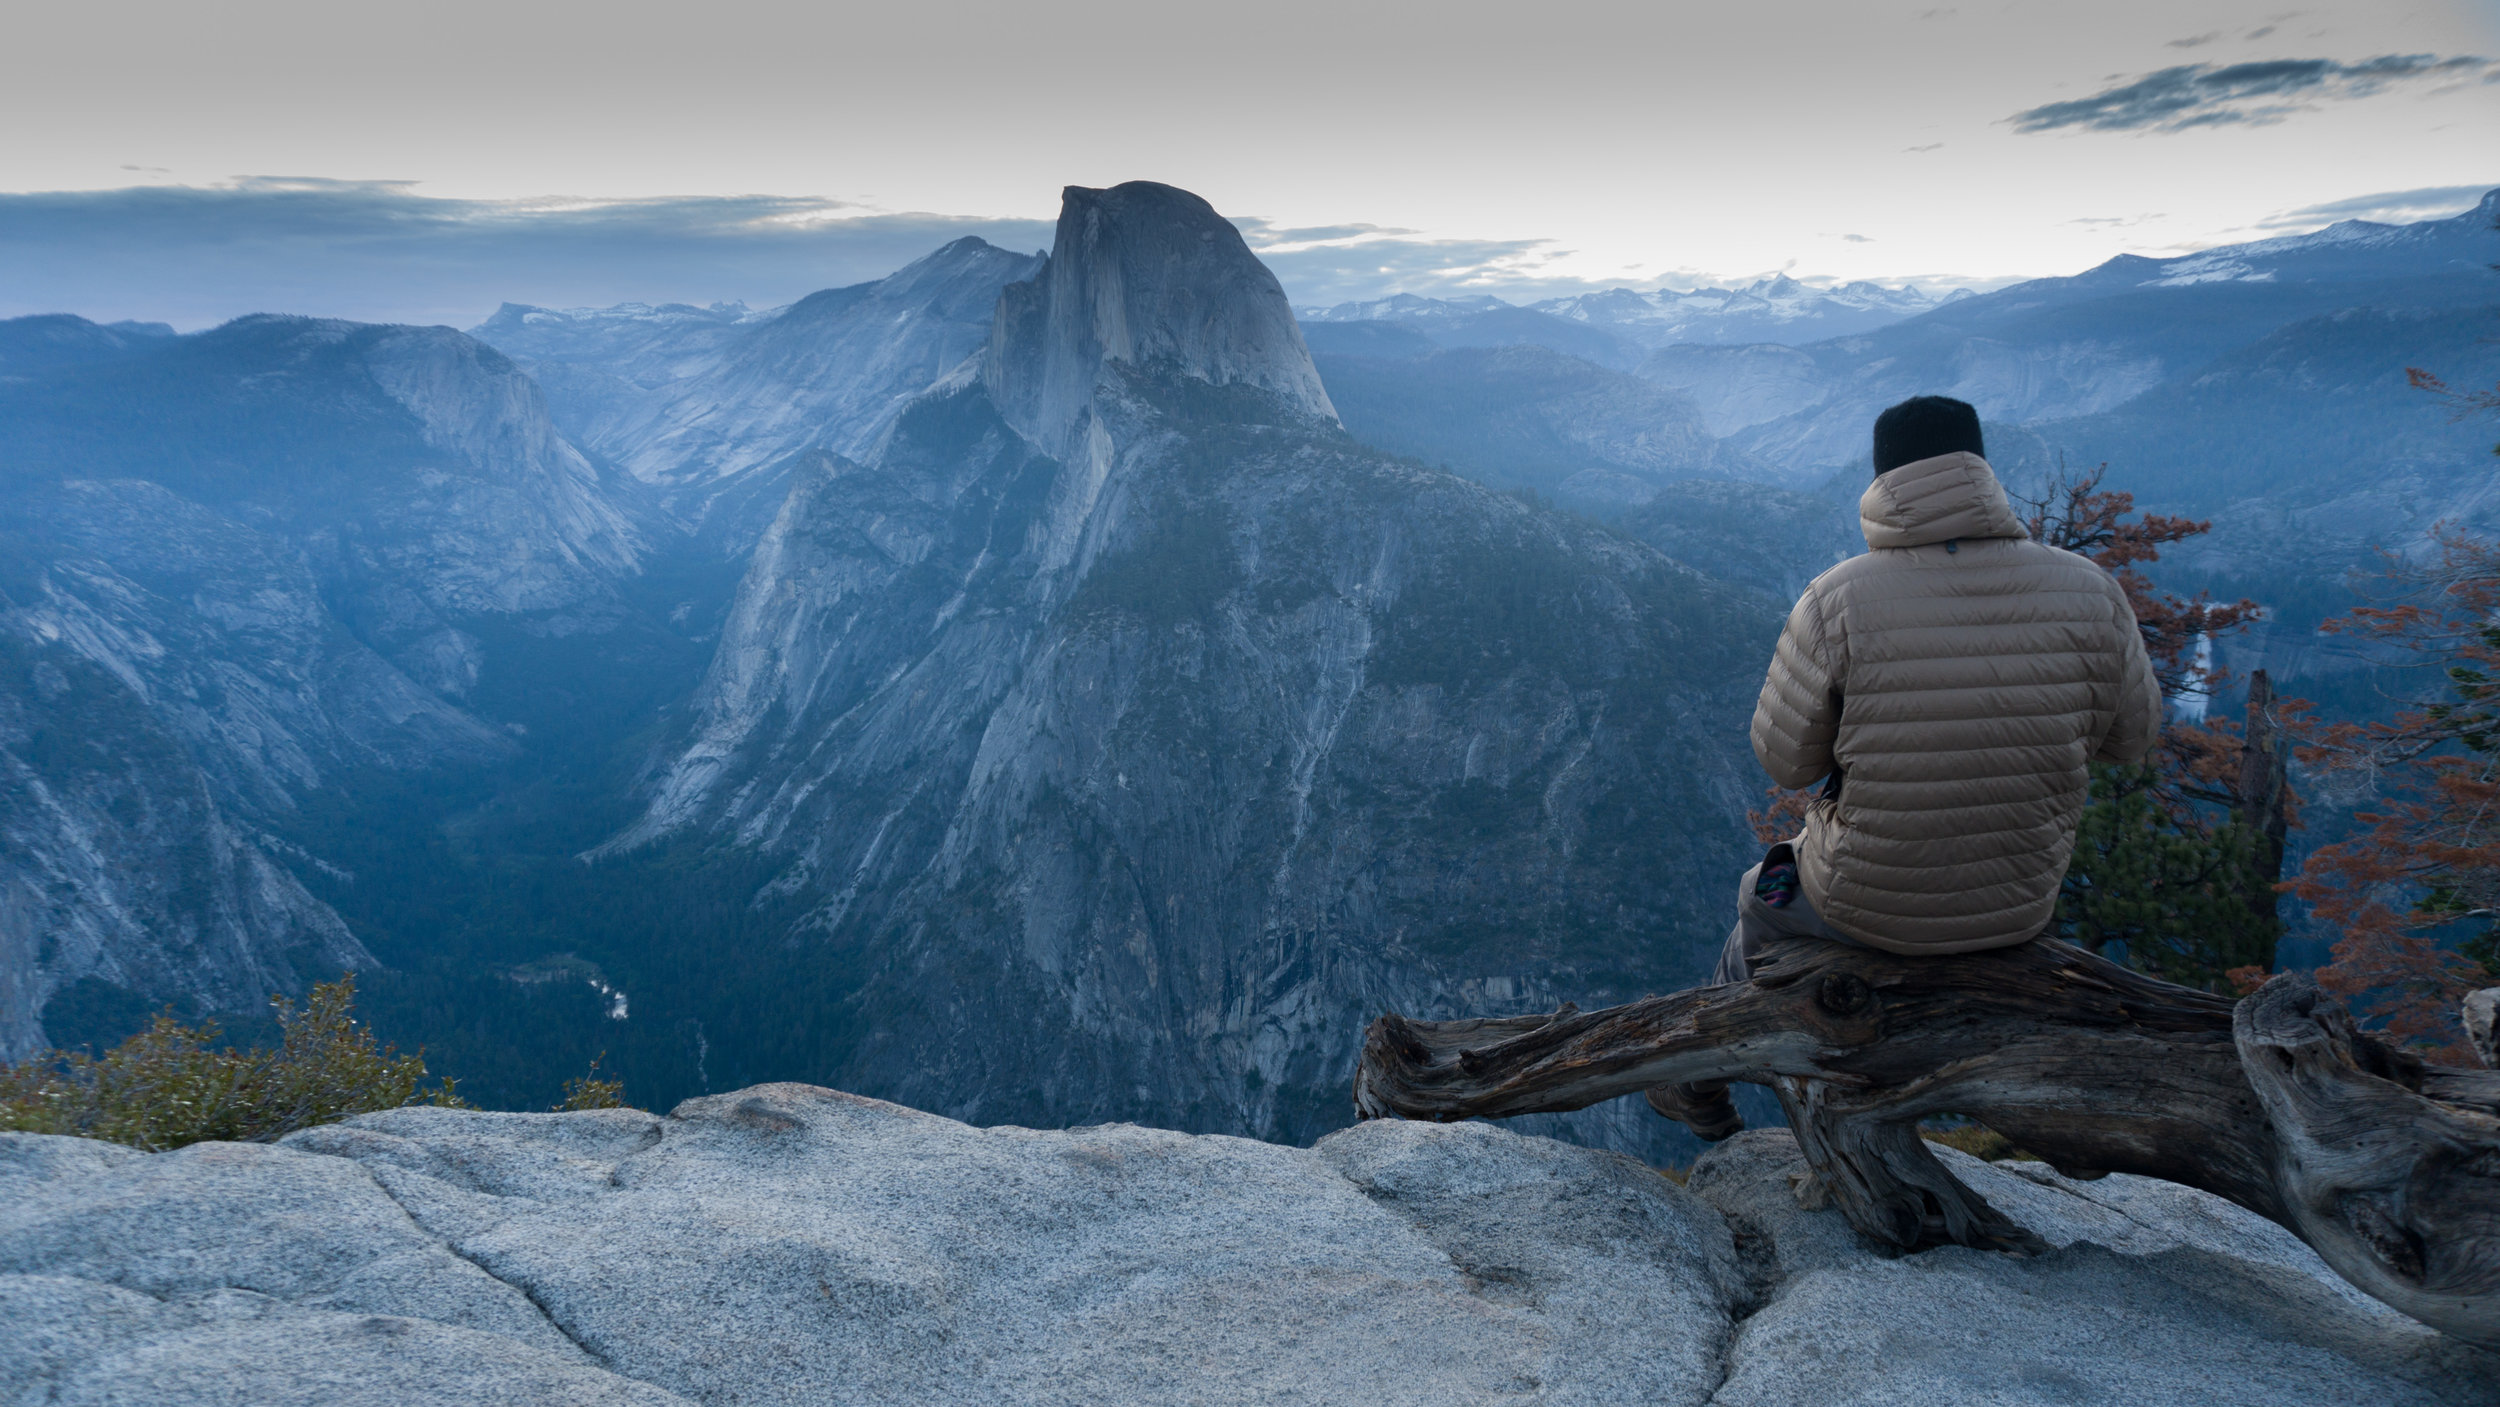 Glacier Pioint, Yosemite National Park